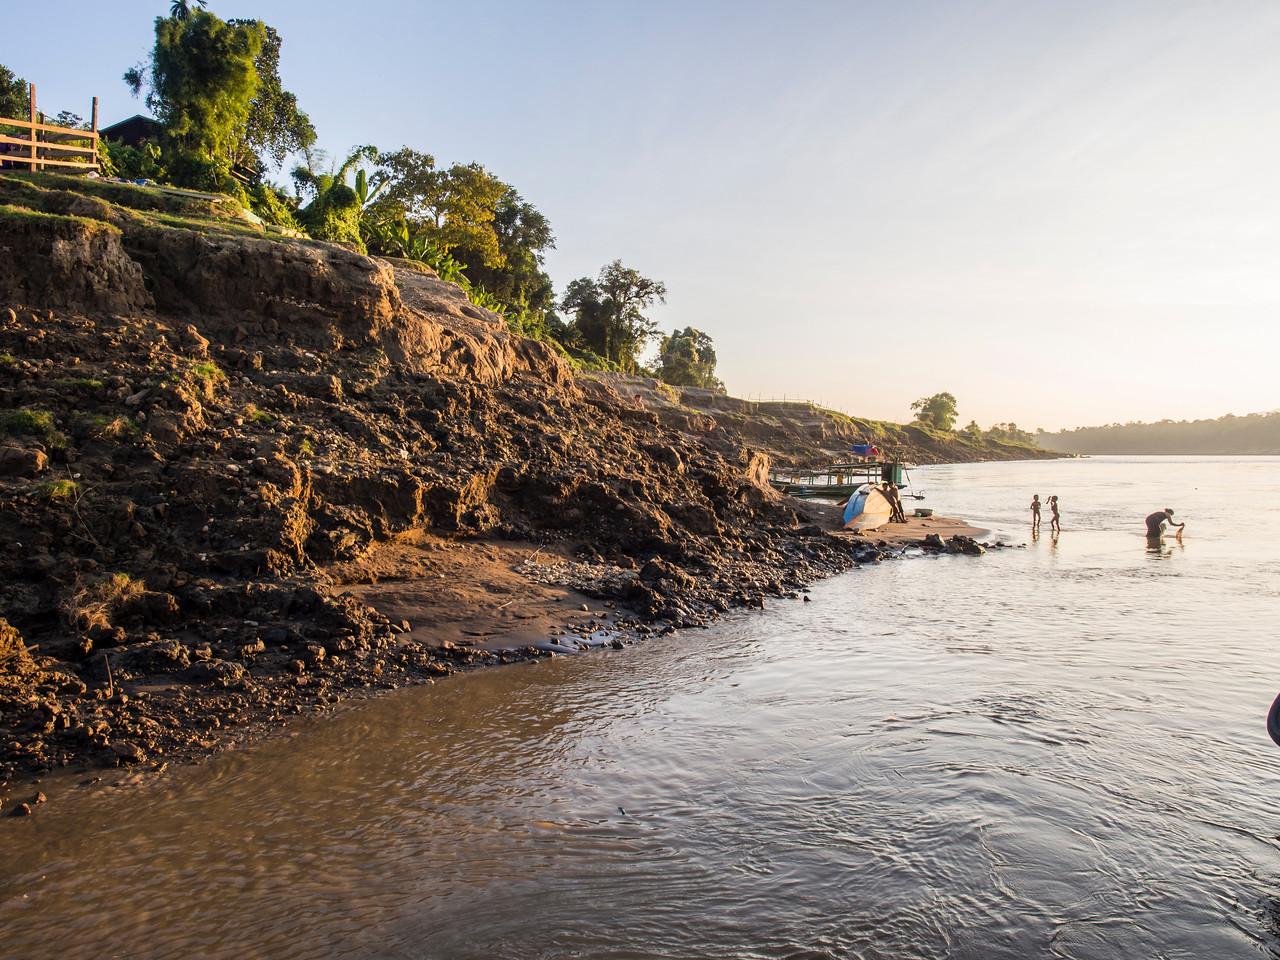 Rivershore, Shan village